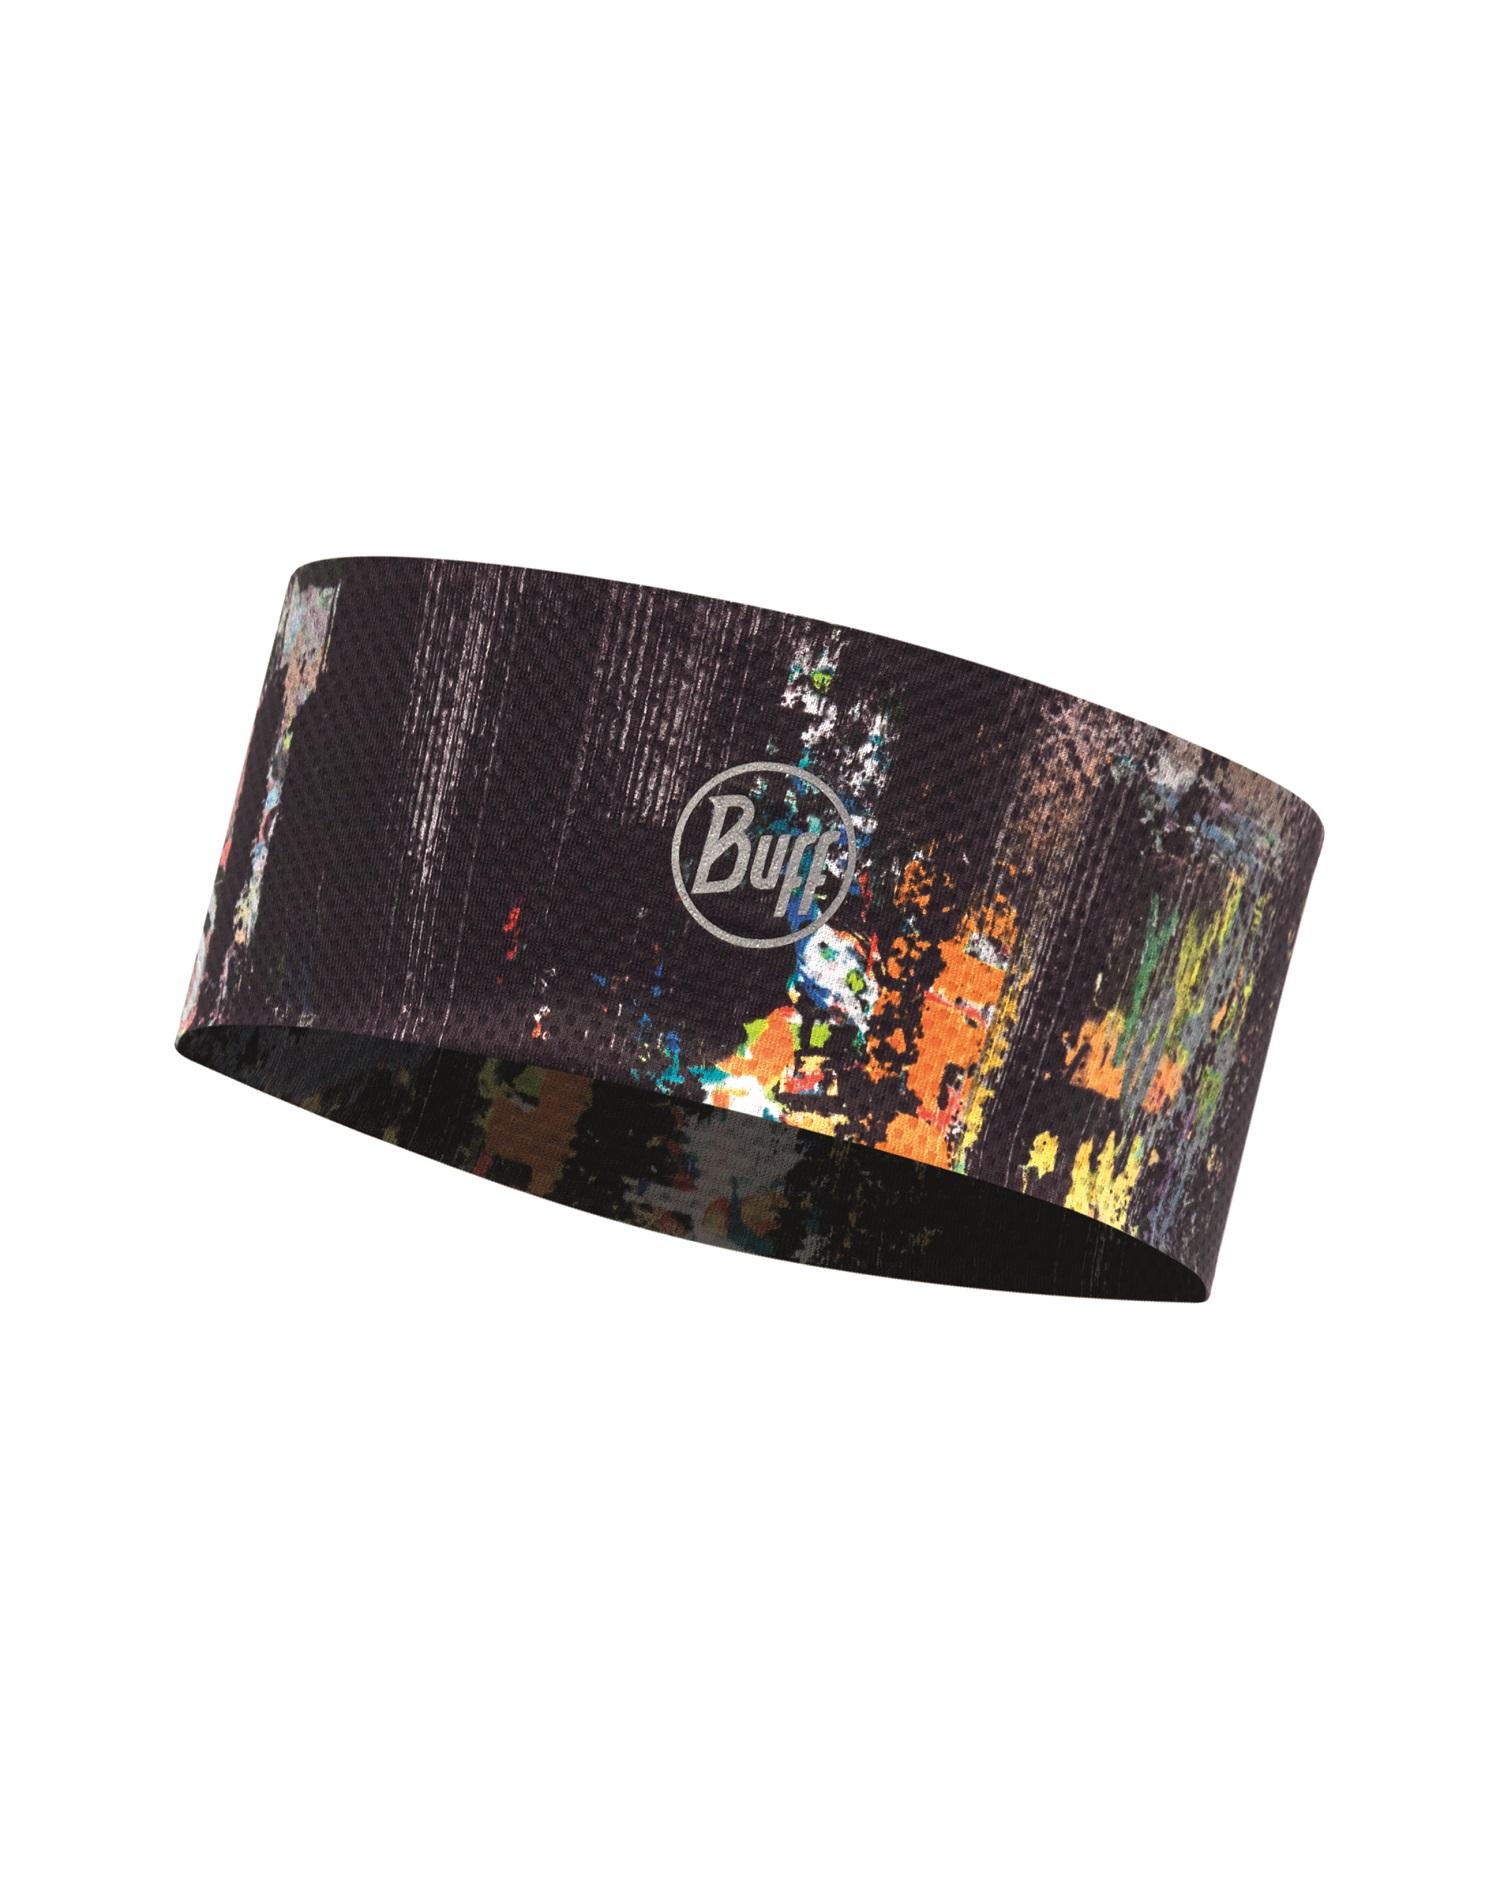 Купить Повязка BUFF FASTWICK HEADBAND R-GRAFFITI BLACK, Банданы и шарфы Buff ®, 1340771